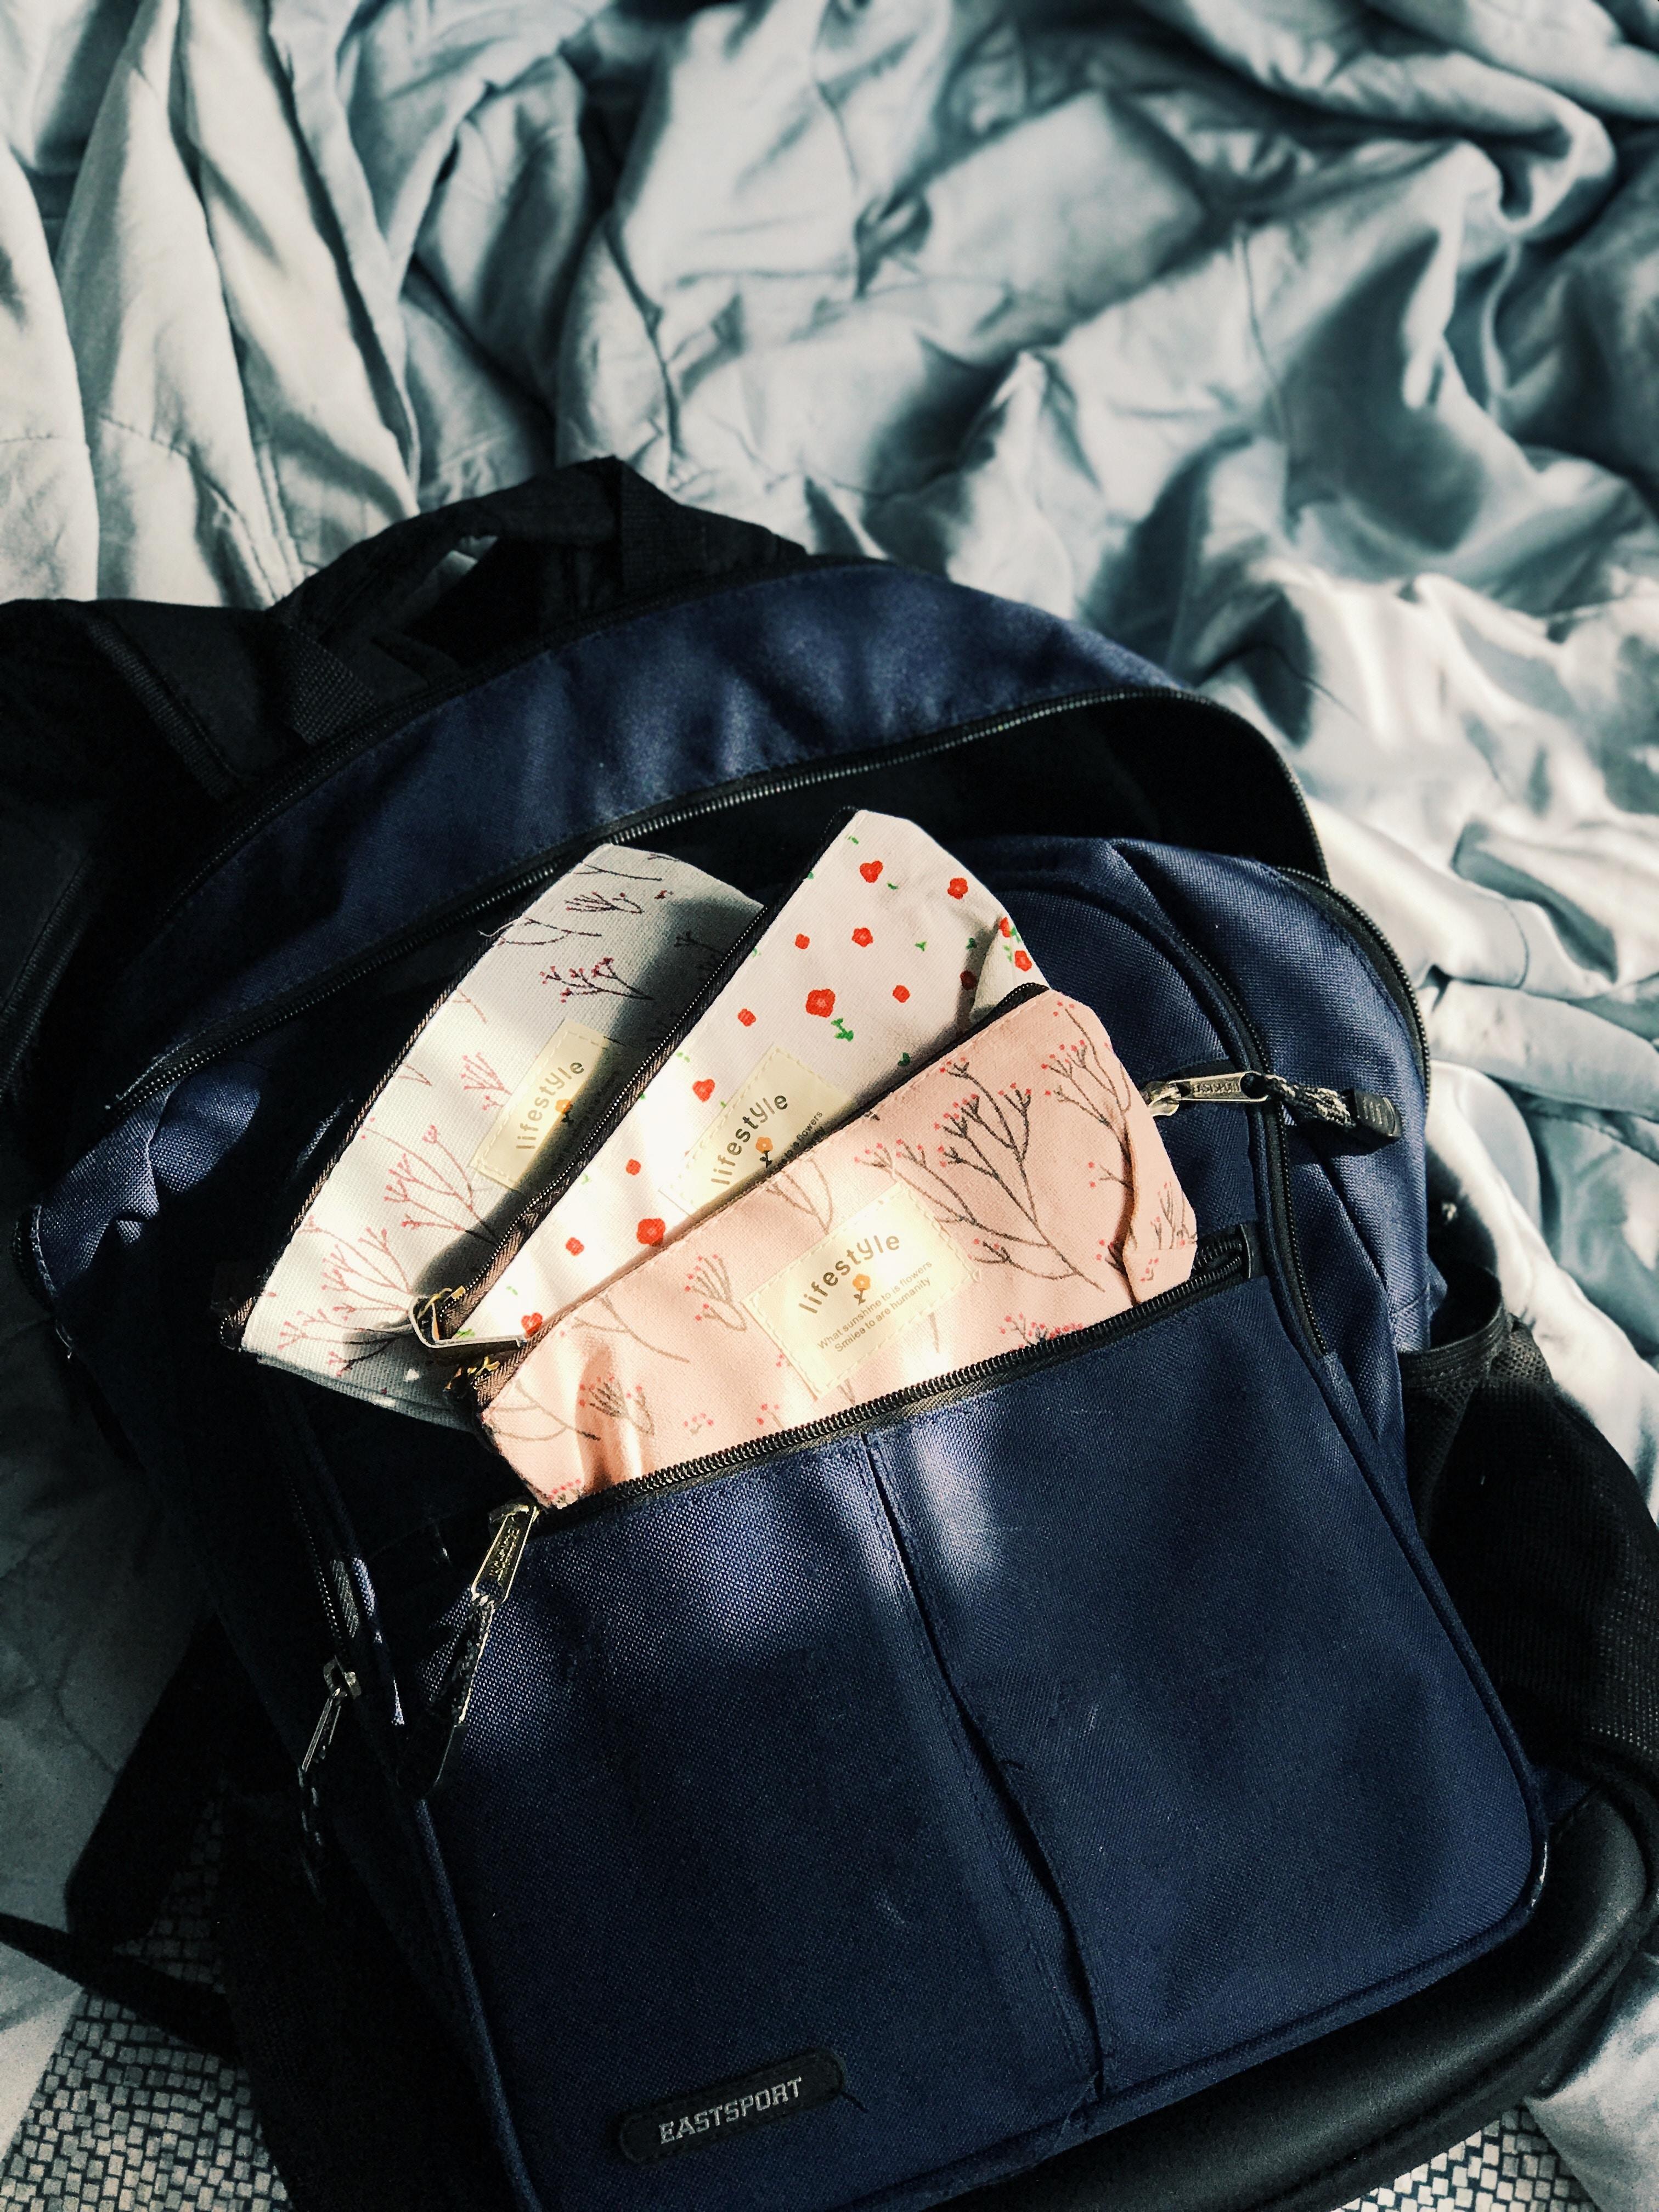 three white plastic packs in black leather bag